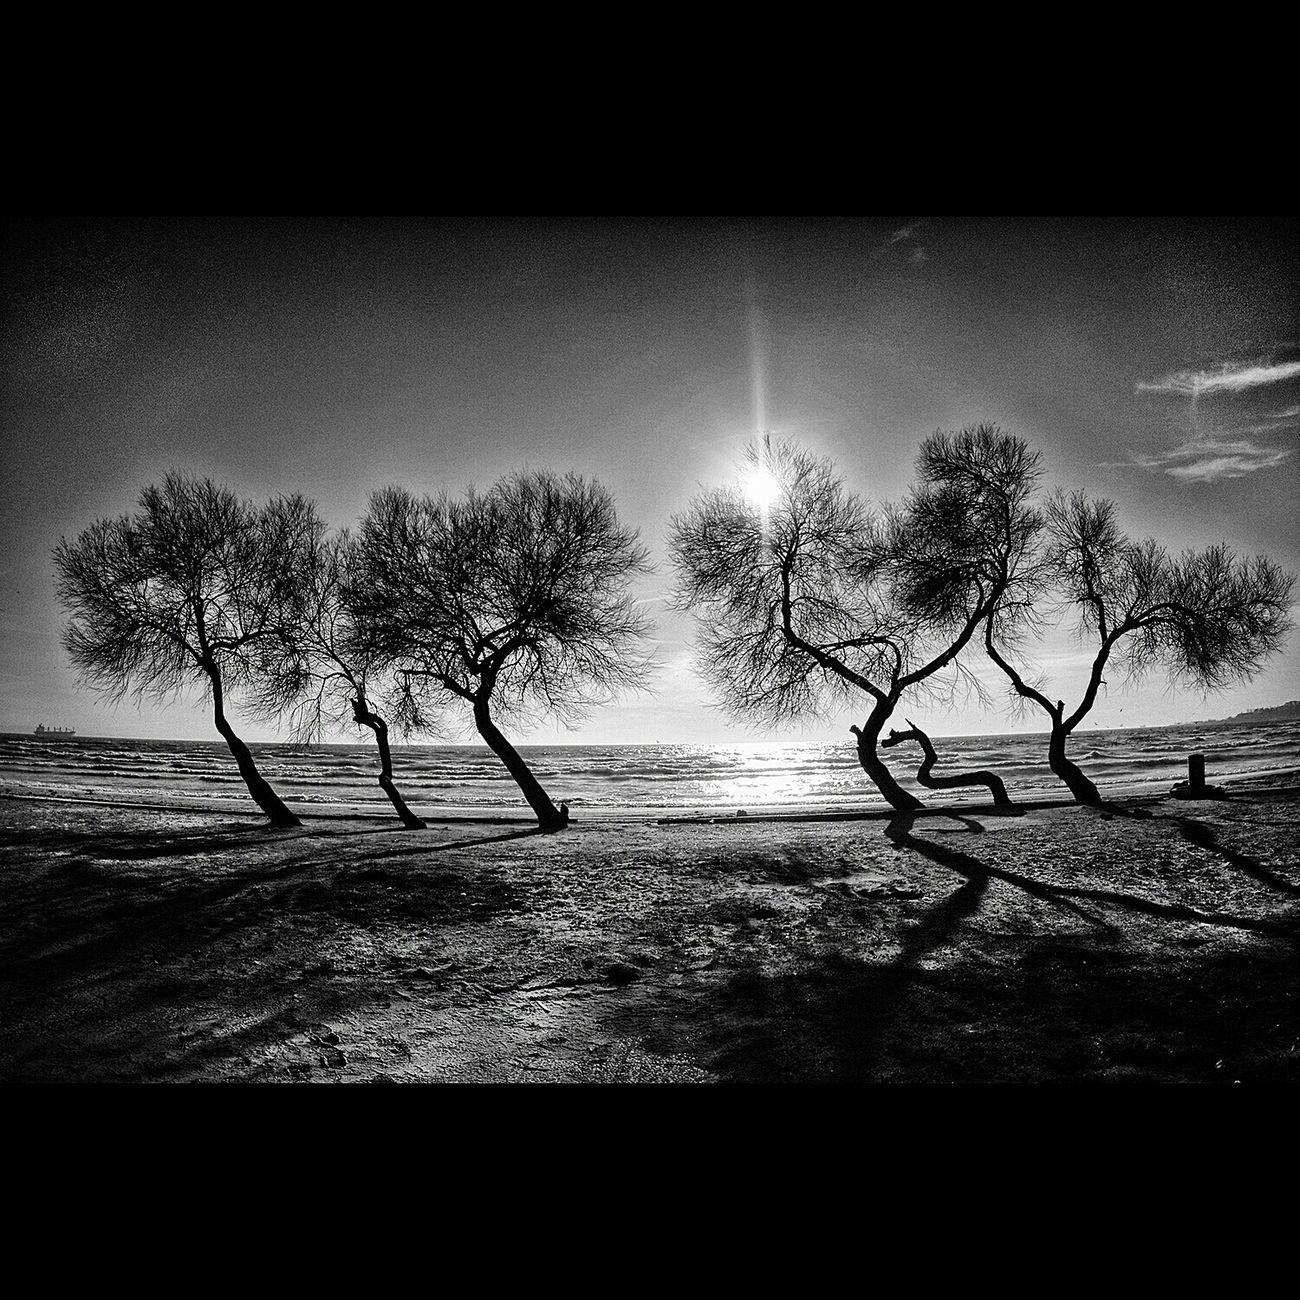 Monochrome Eyem Best Shots Black & White Siyah & Beyaz Ig_istanbul Sea And Sky Eyem Nature Lovers  @people Eyem Best Shots Nature_collection